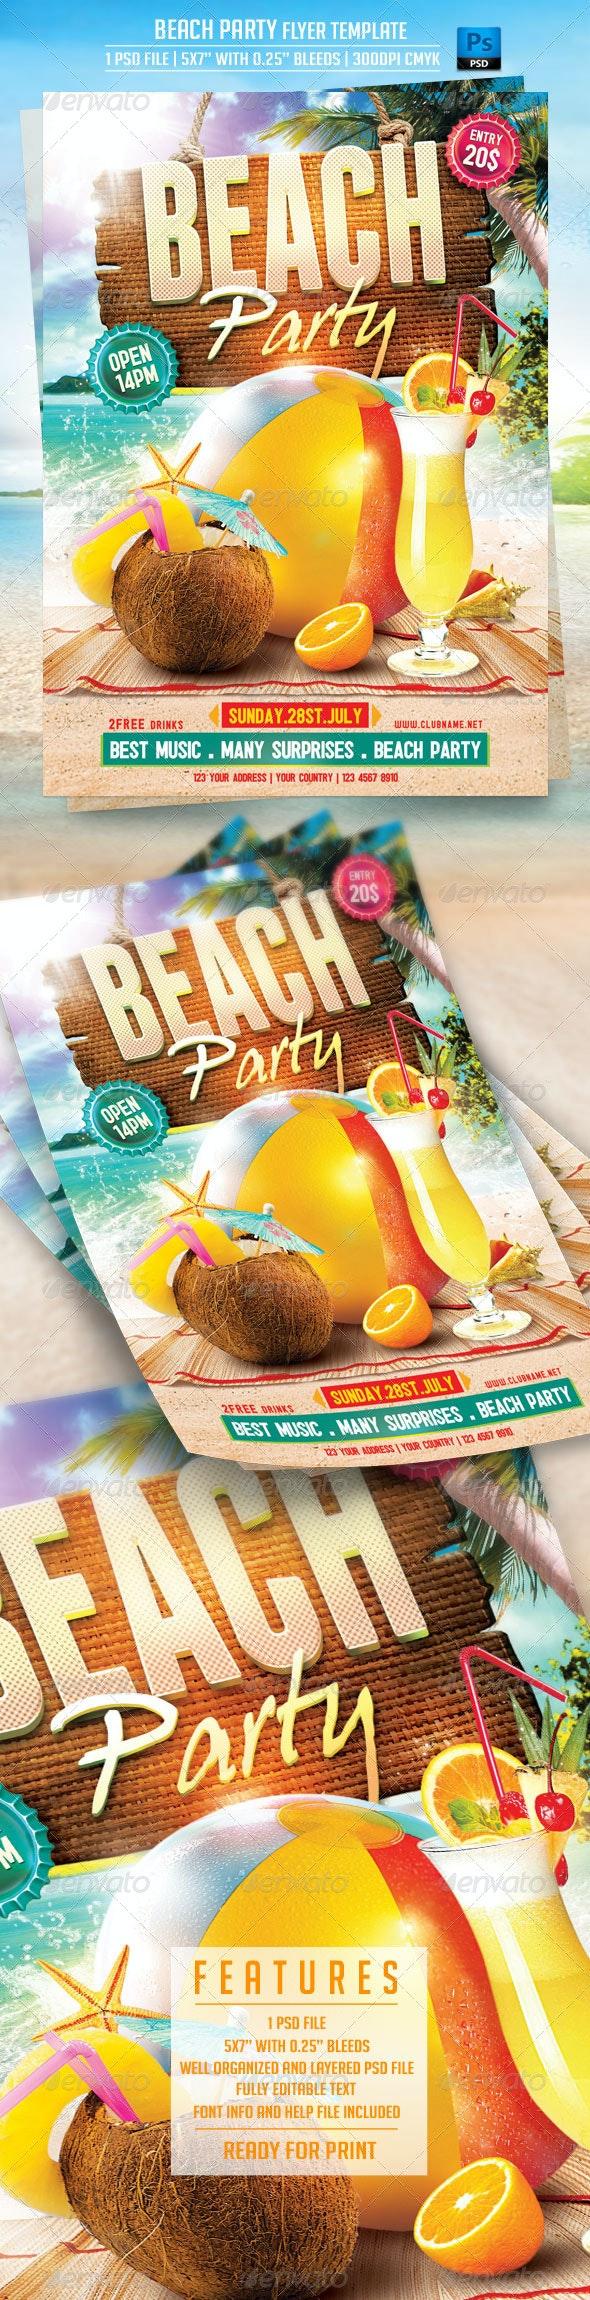 Beach Party Flyer Template - Flyers Print Templates